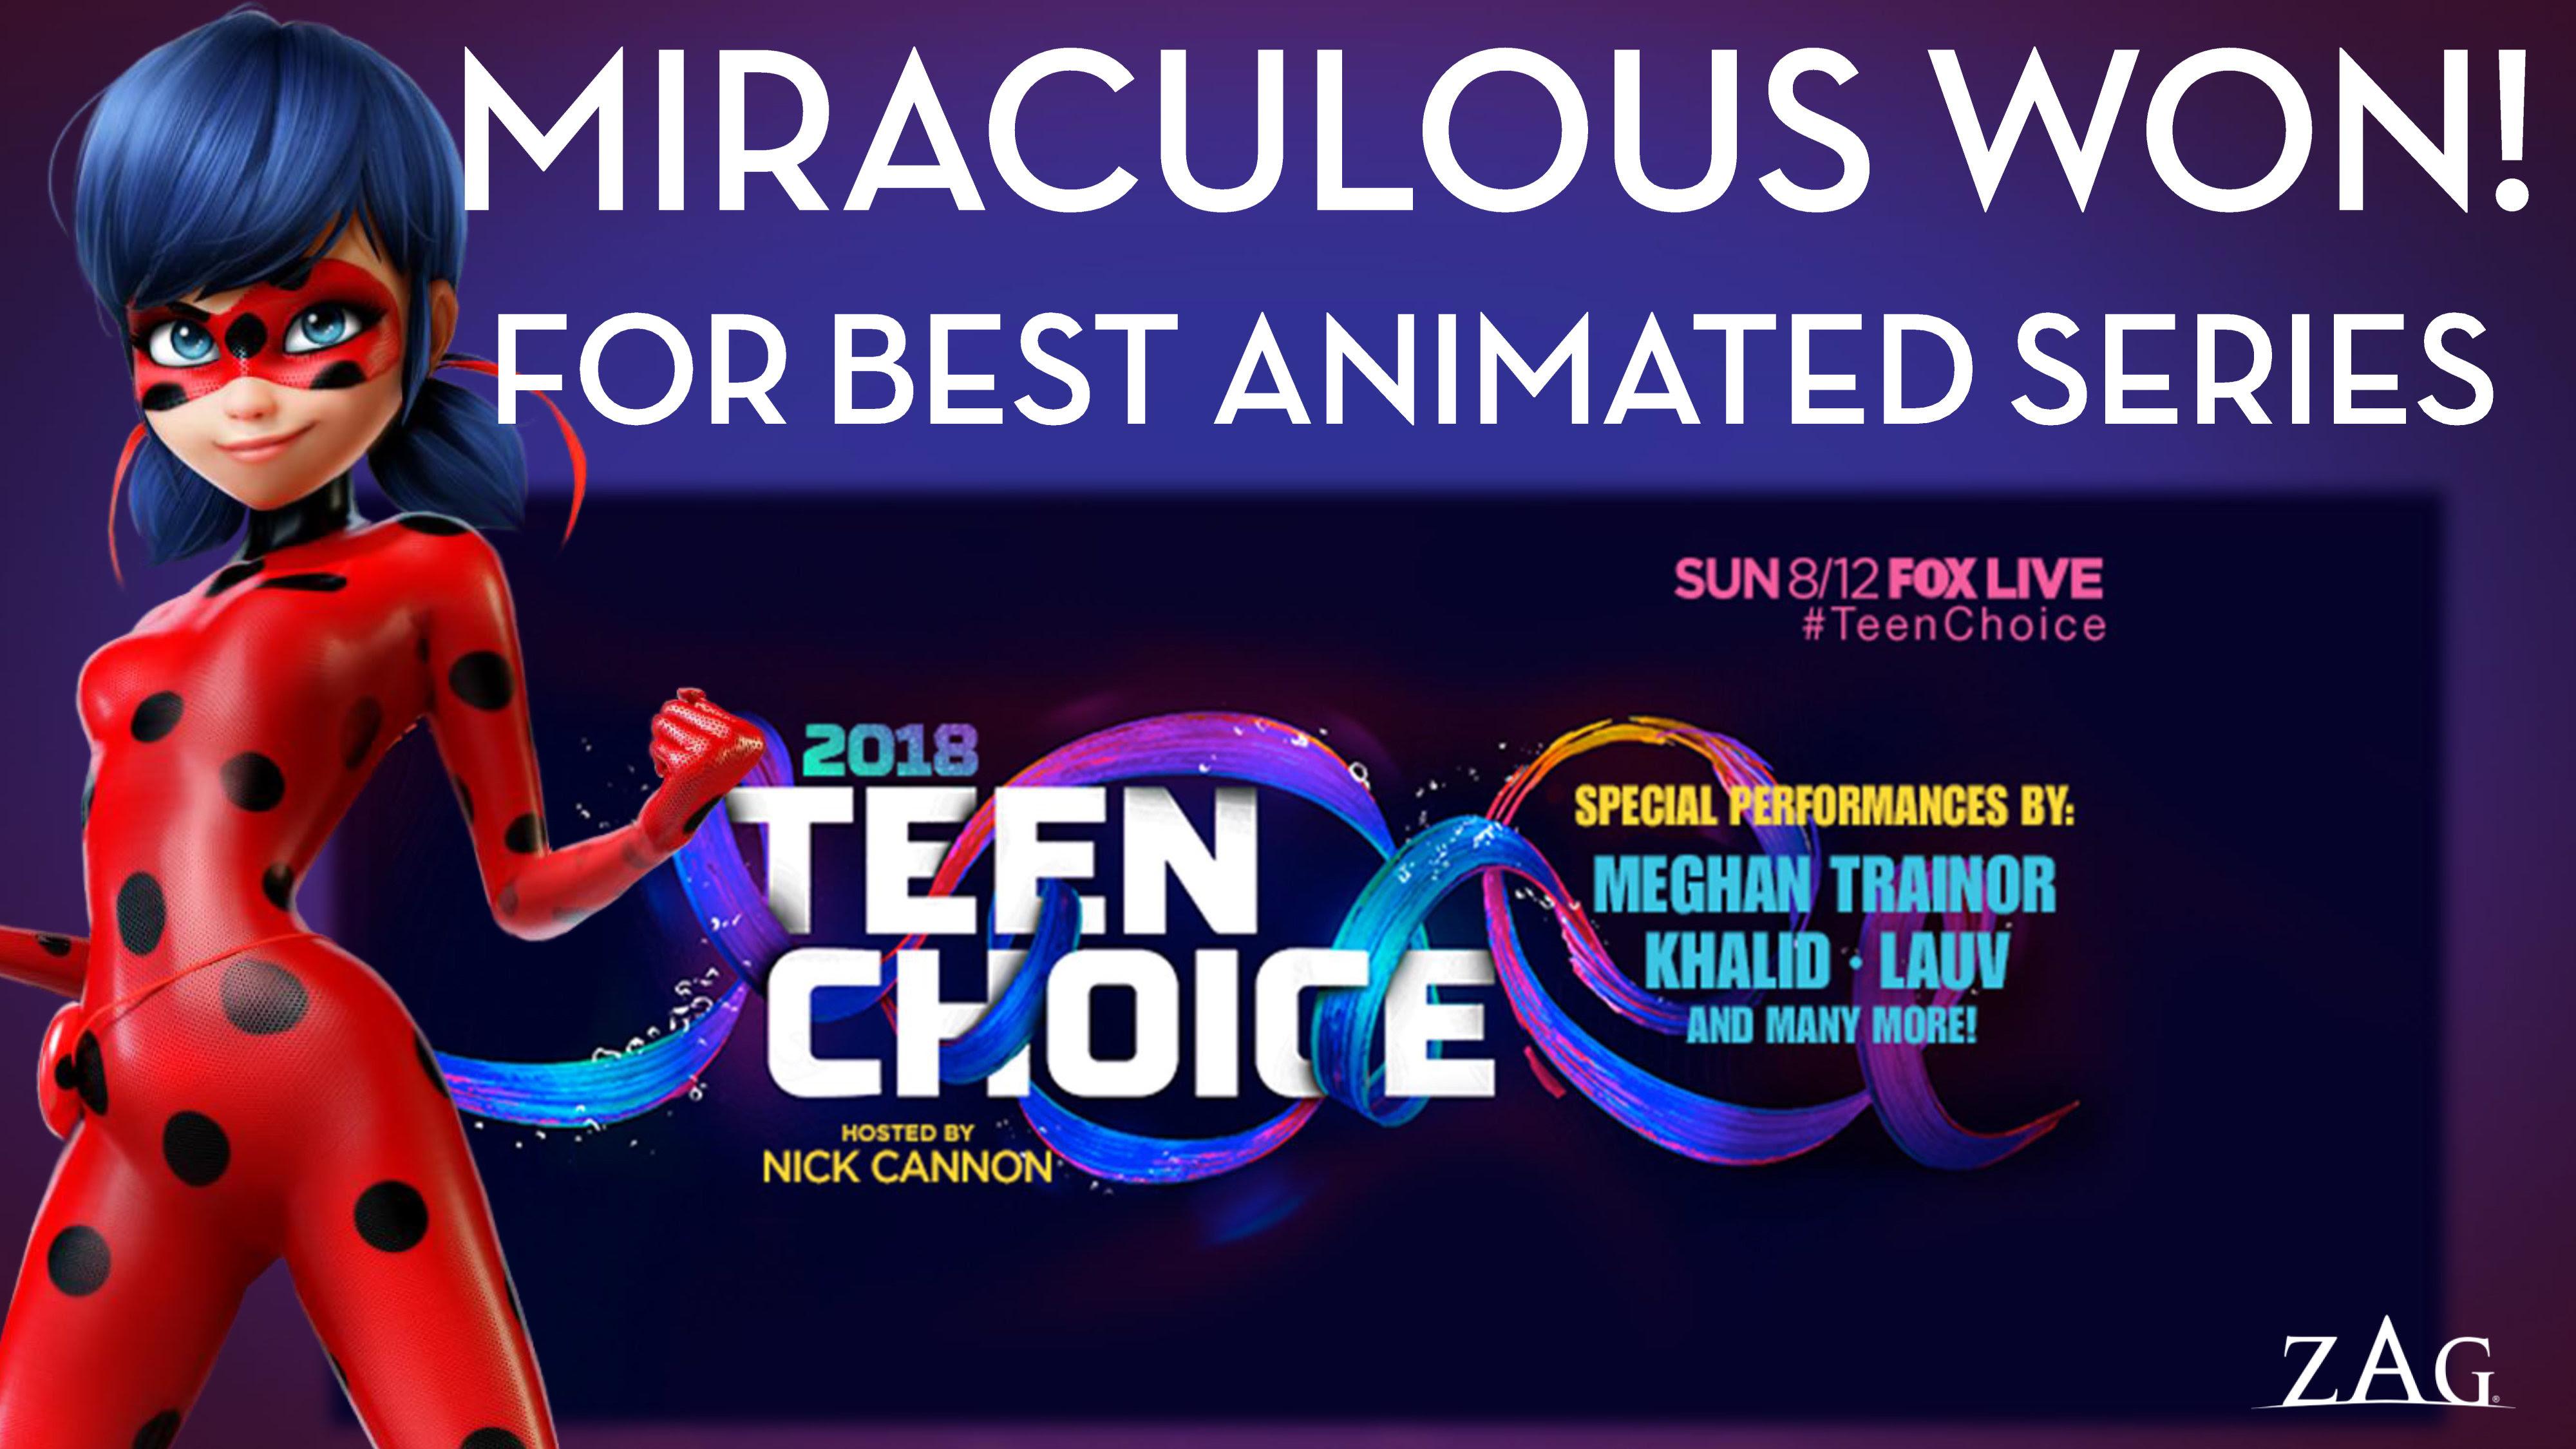 Miraculous Ladybug Christmas Special.Miraculous Tales Of Ladybug Cat Noir Wins Teen Choice